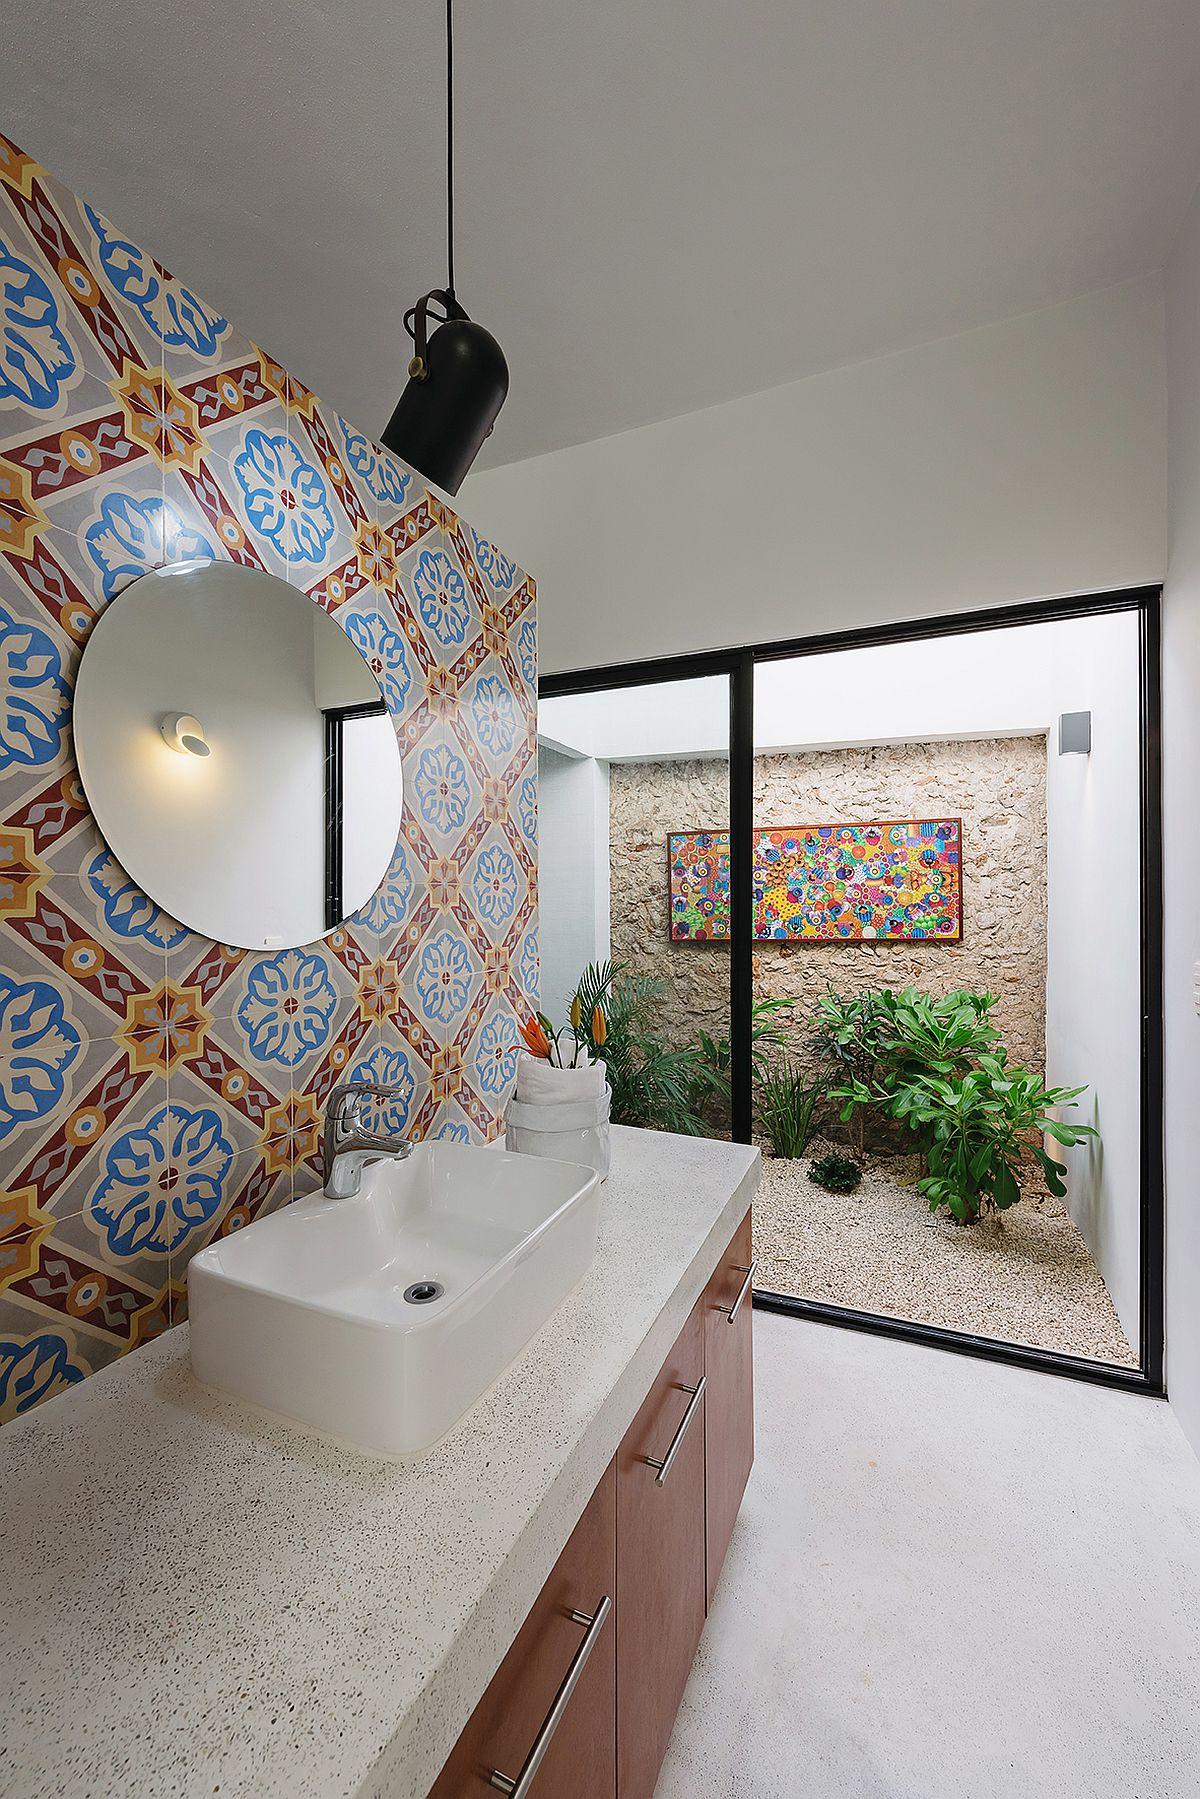 Small-outdoor-atrium-brings-light-into-the-bathroom